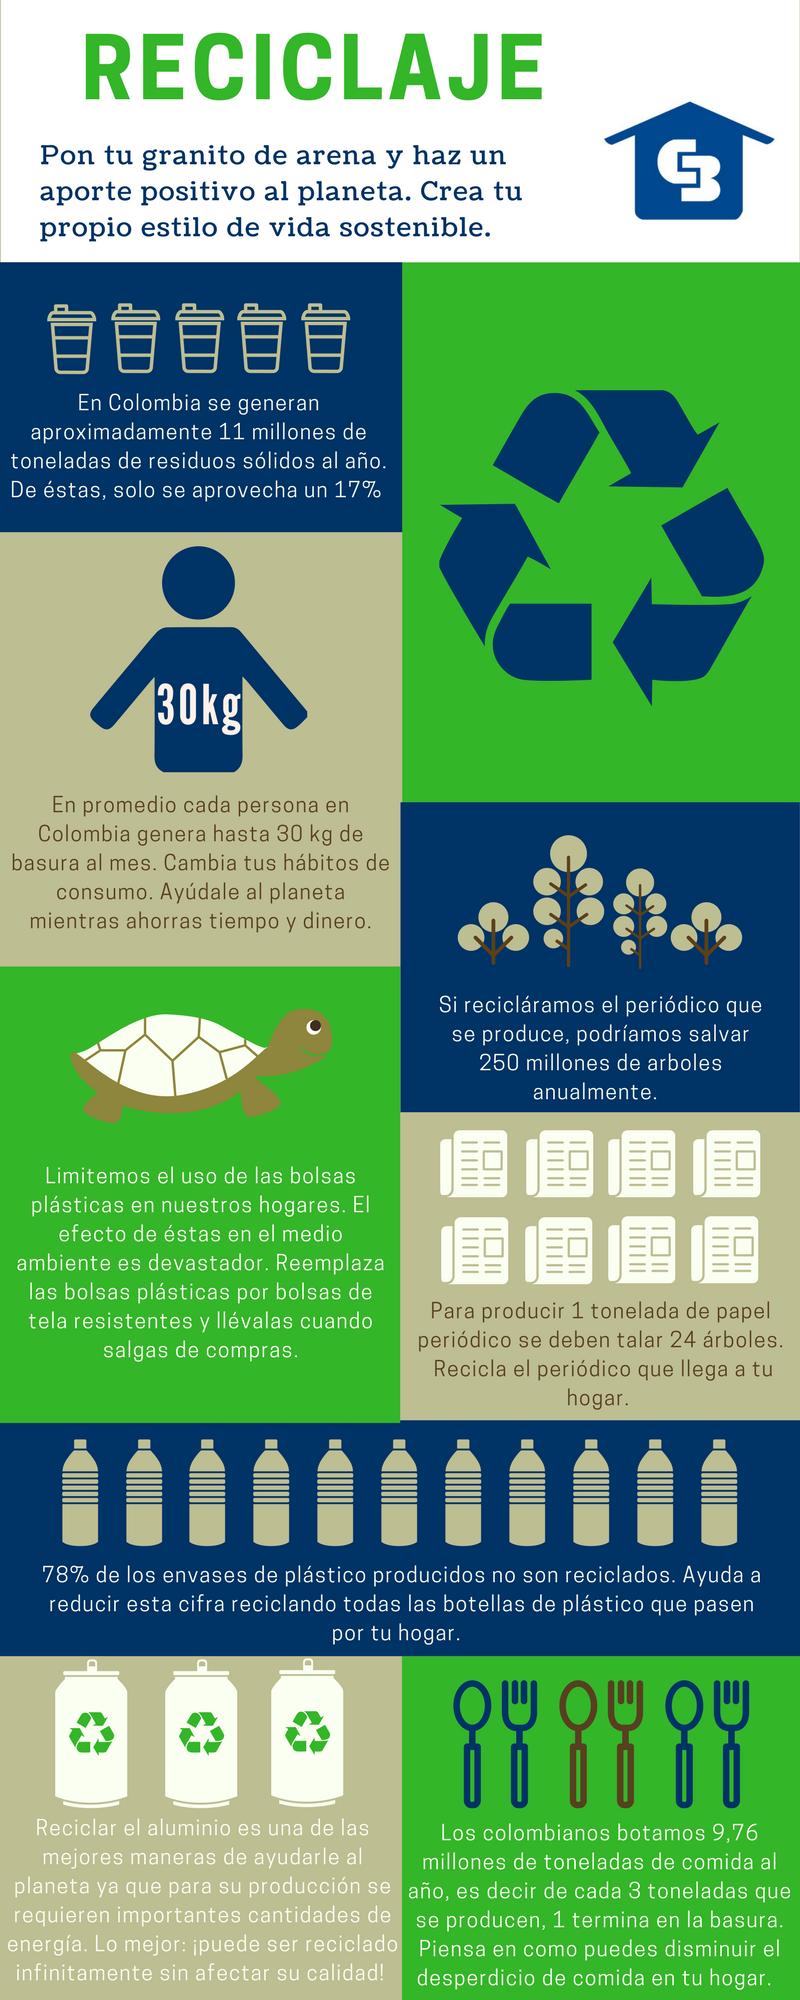 La Inmobiliaria Azul Te Invita A Reciclar El Planeta Te Necesita